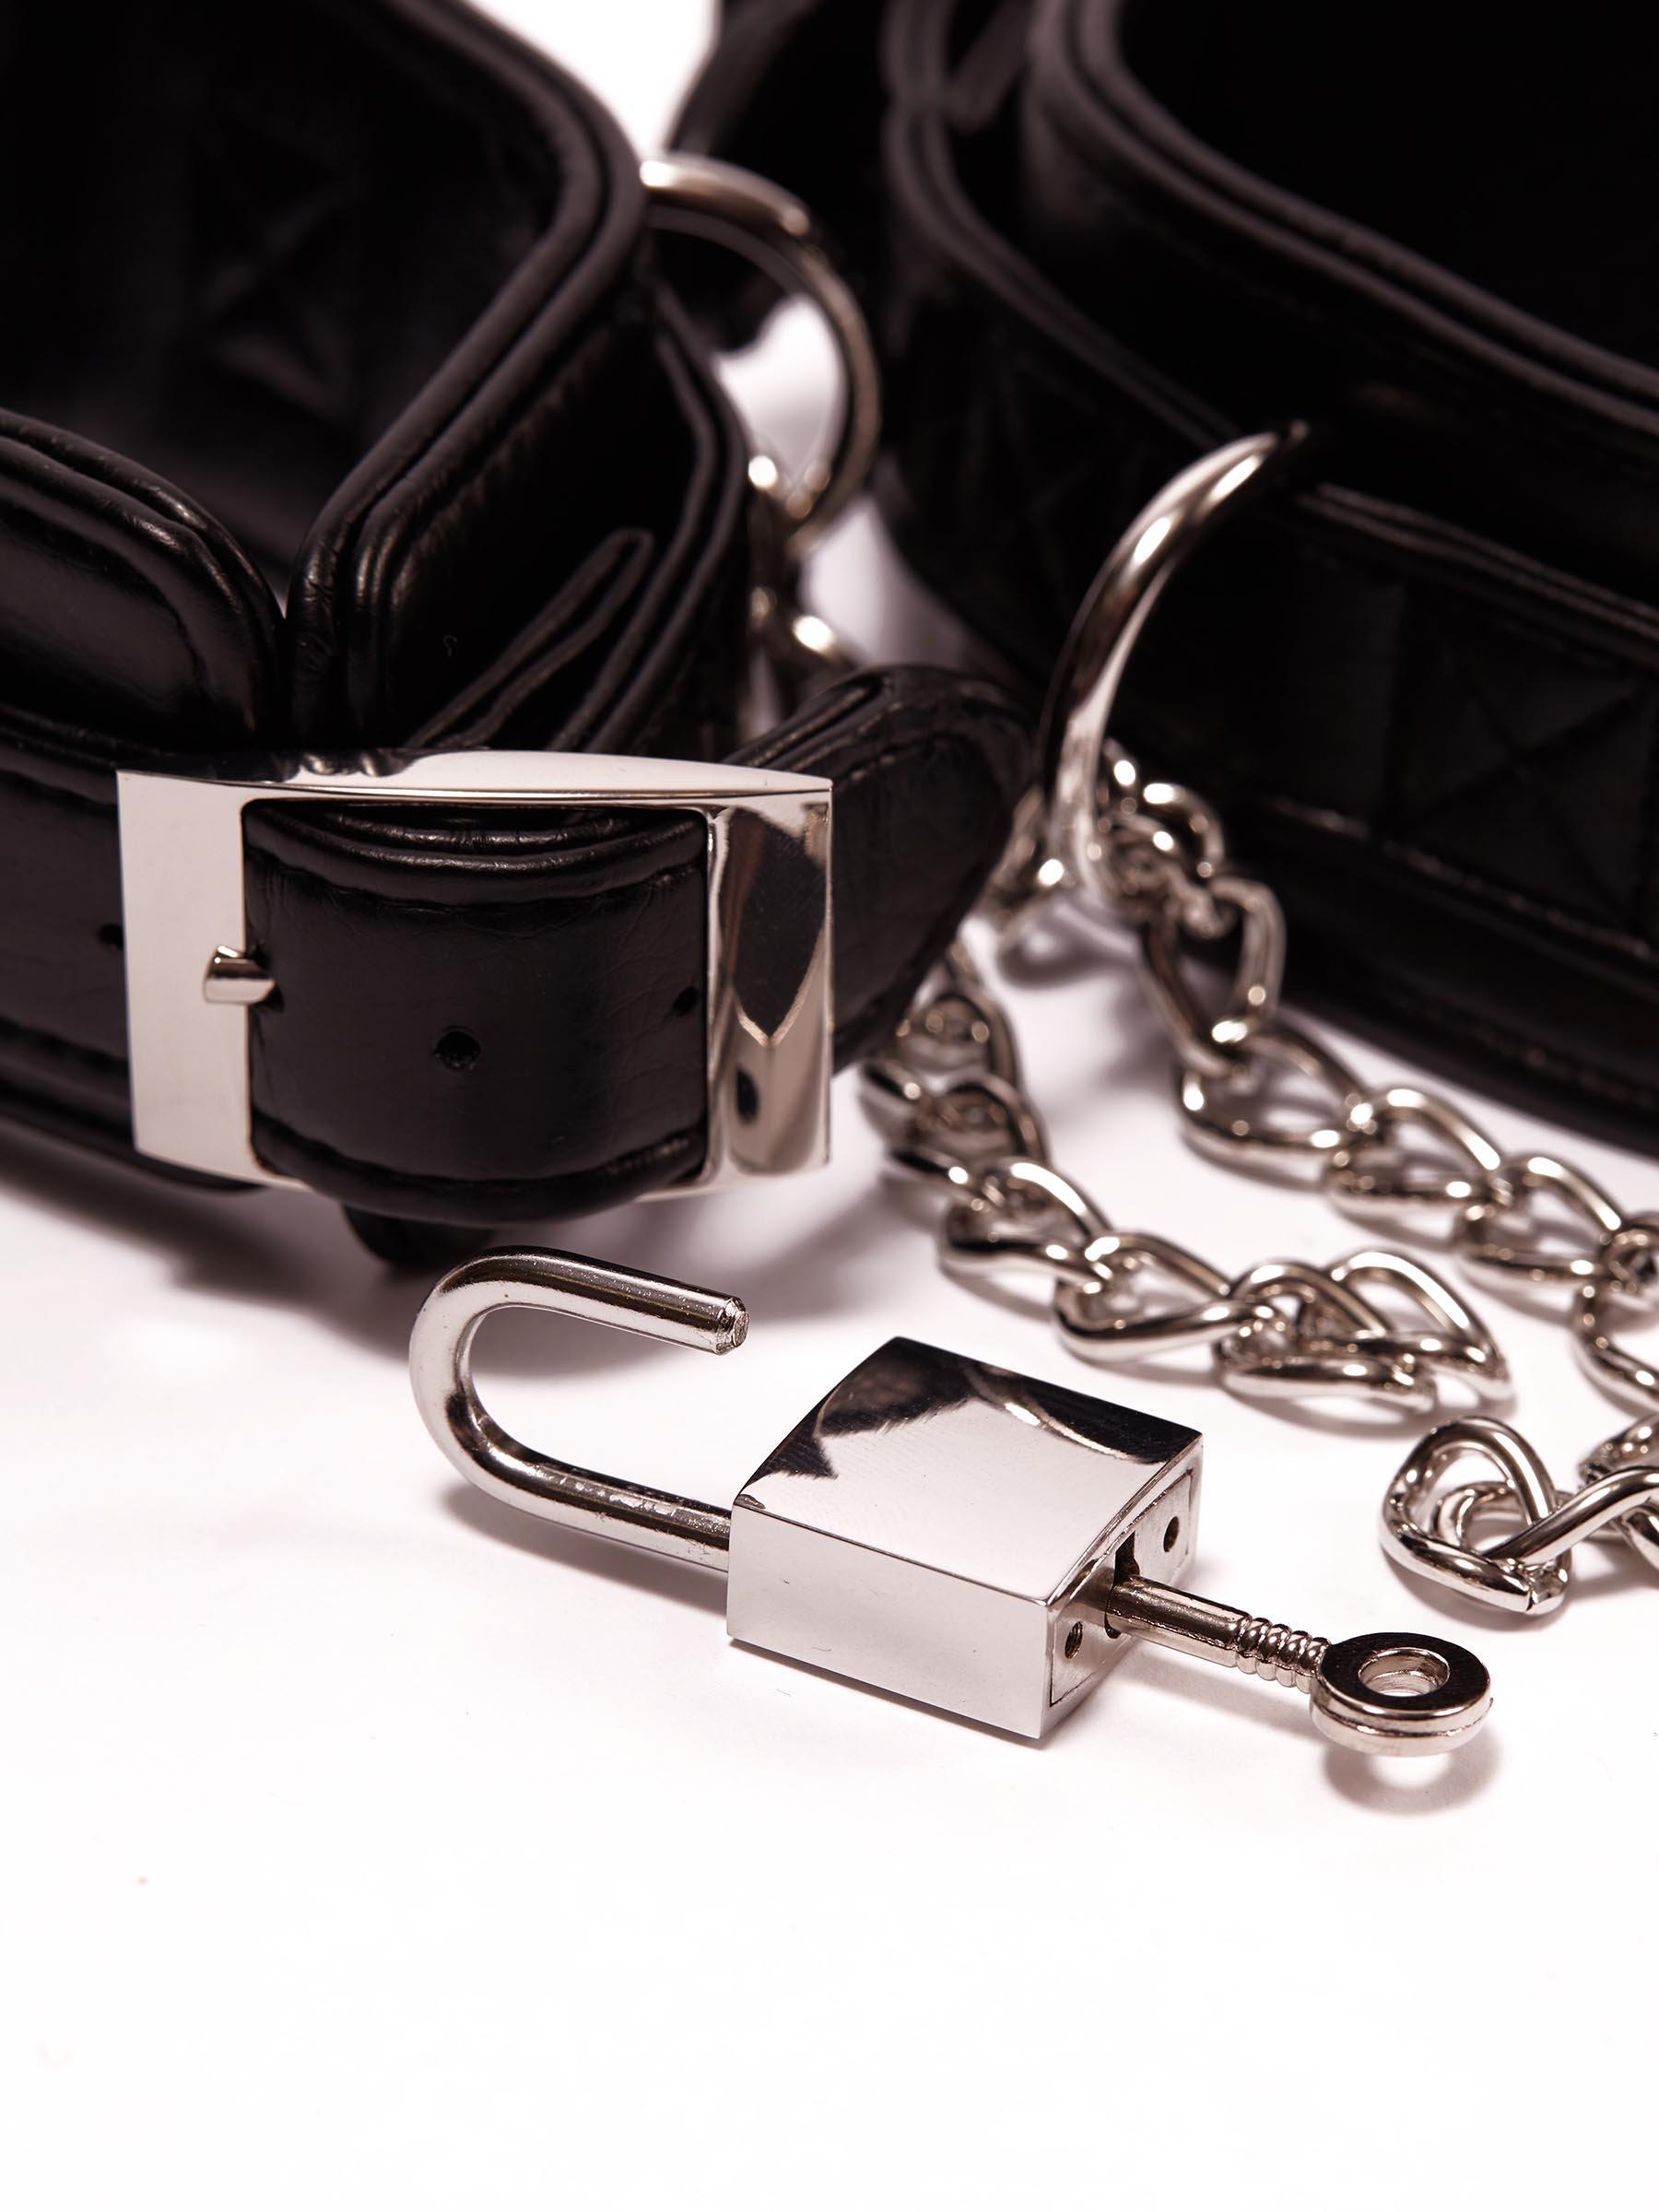 ann summers ankle buckle cuffs bondage restraints fetish